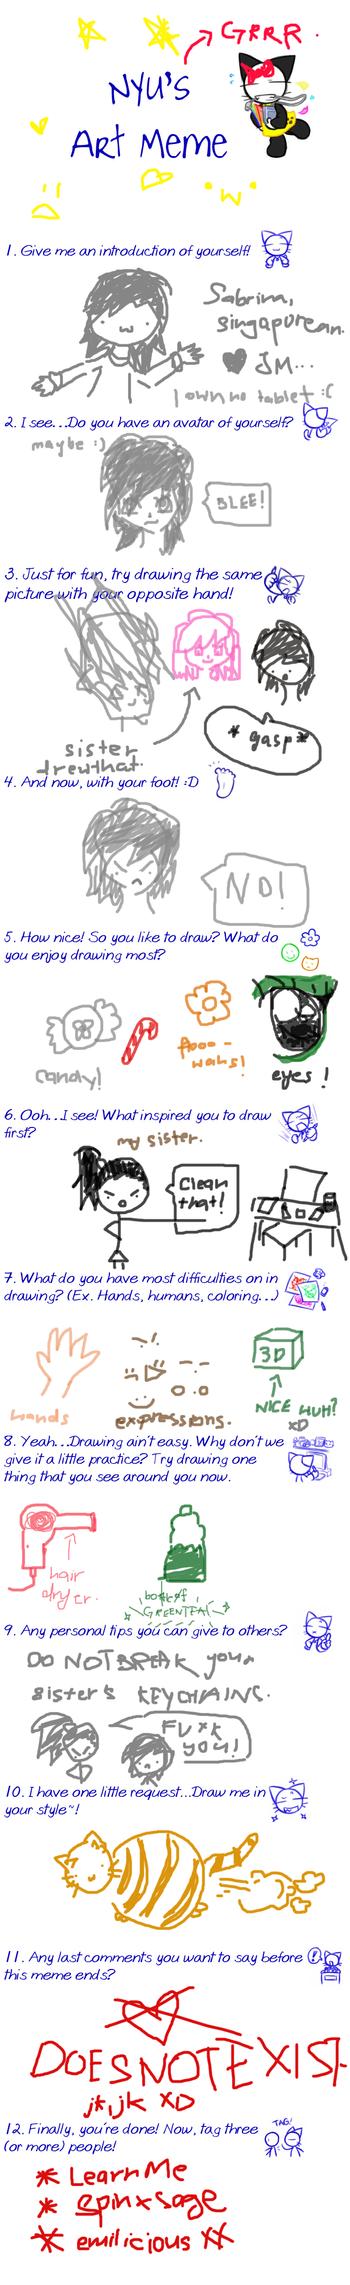 Nyu's GRRR Art Meme by SaboREENA